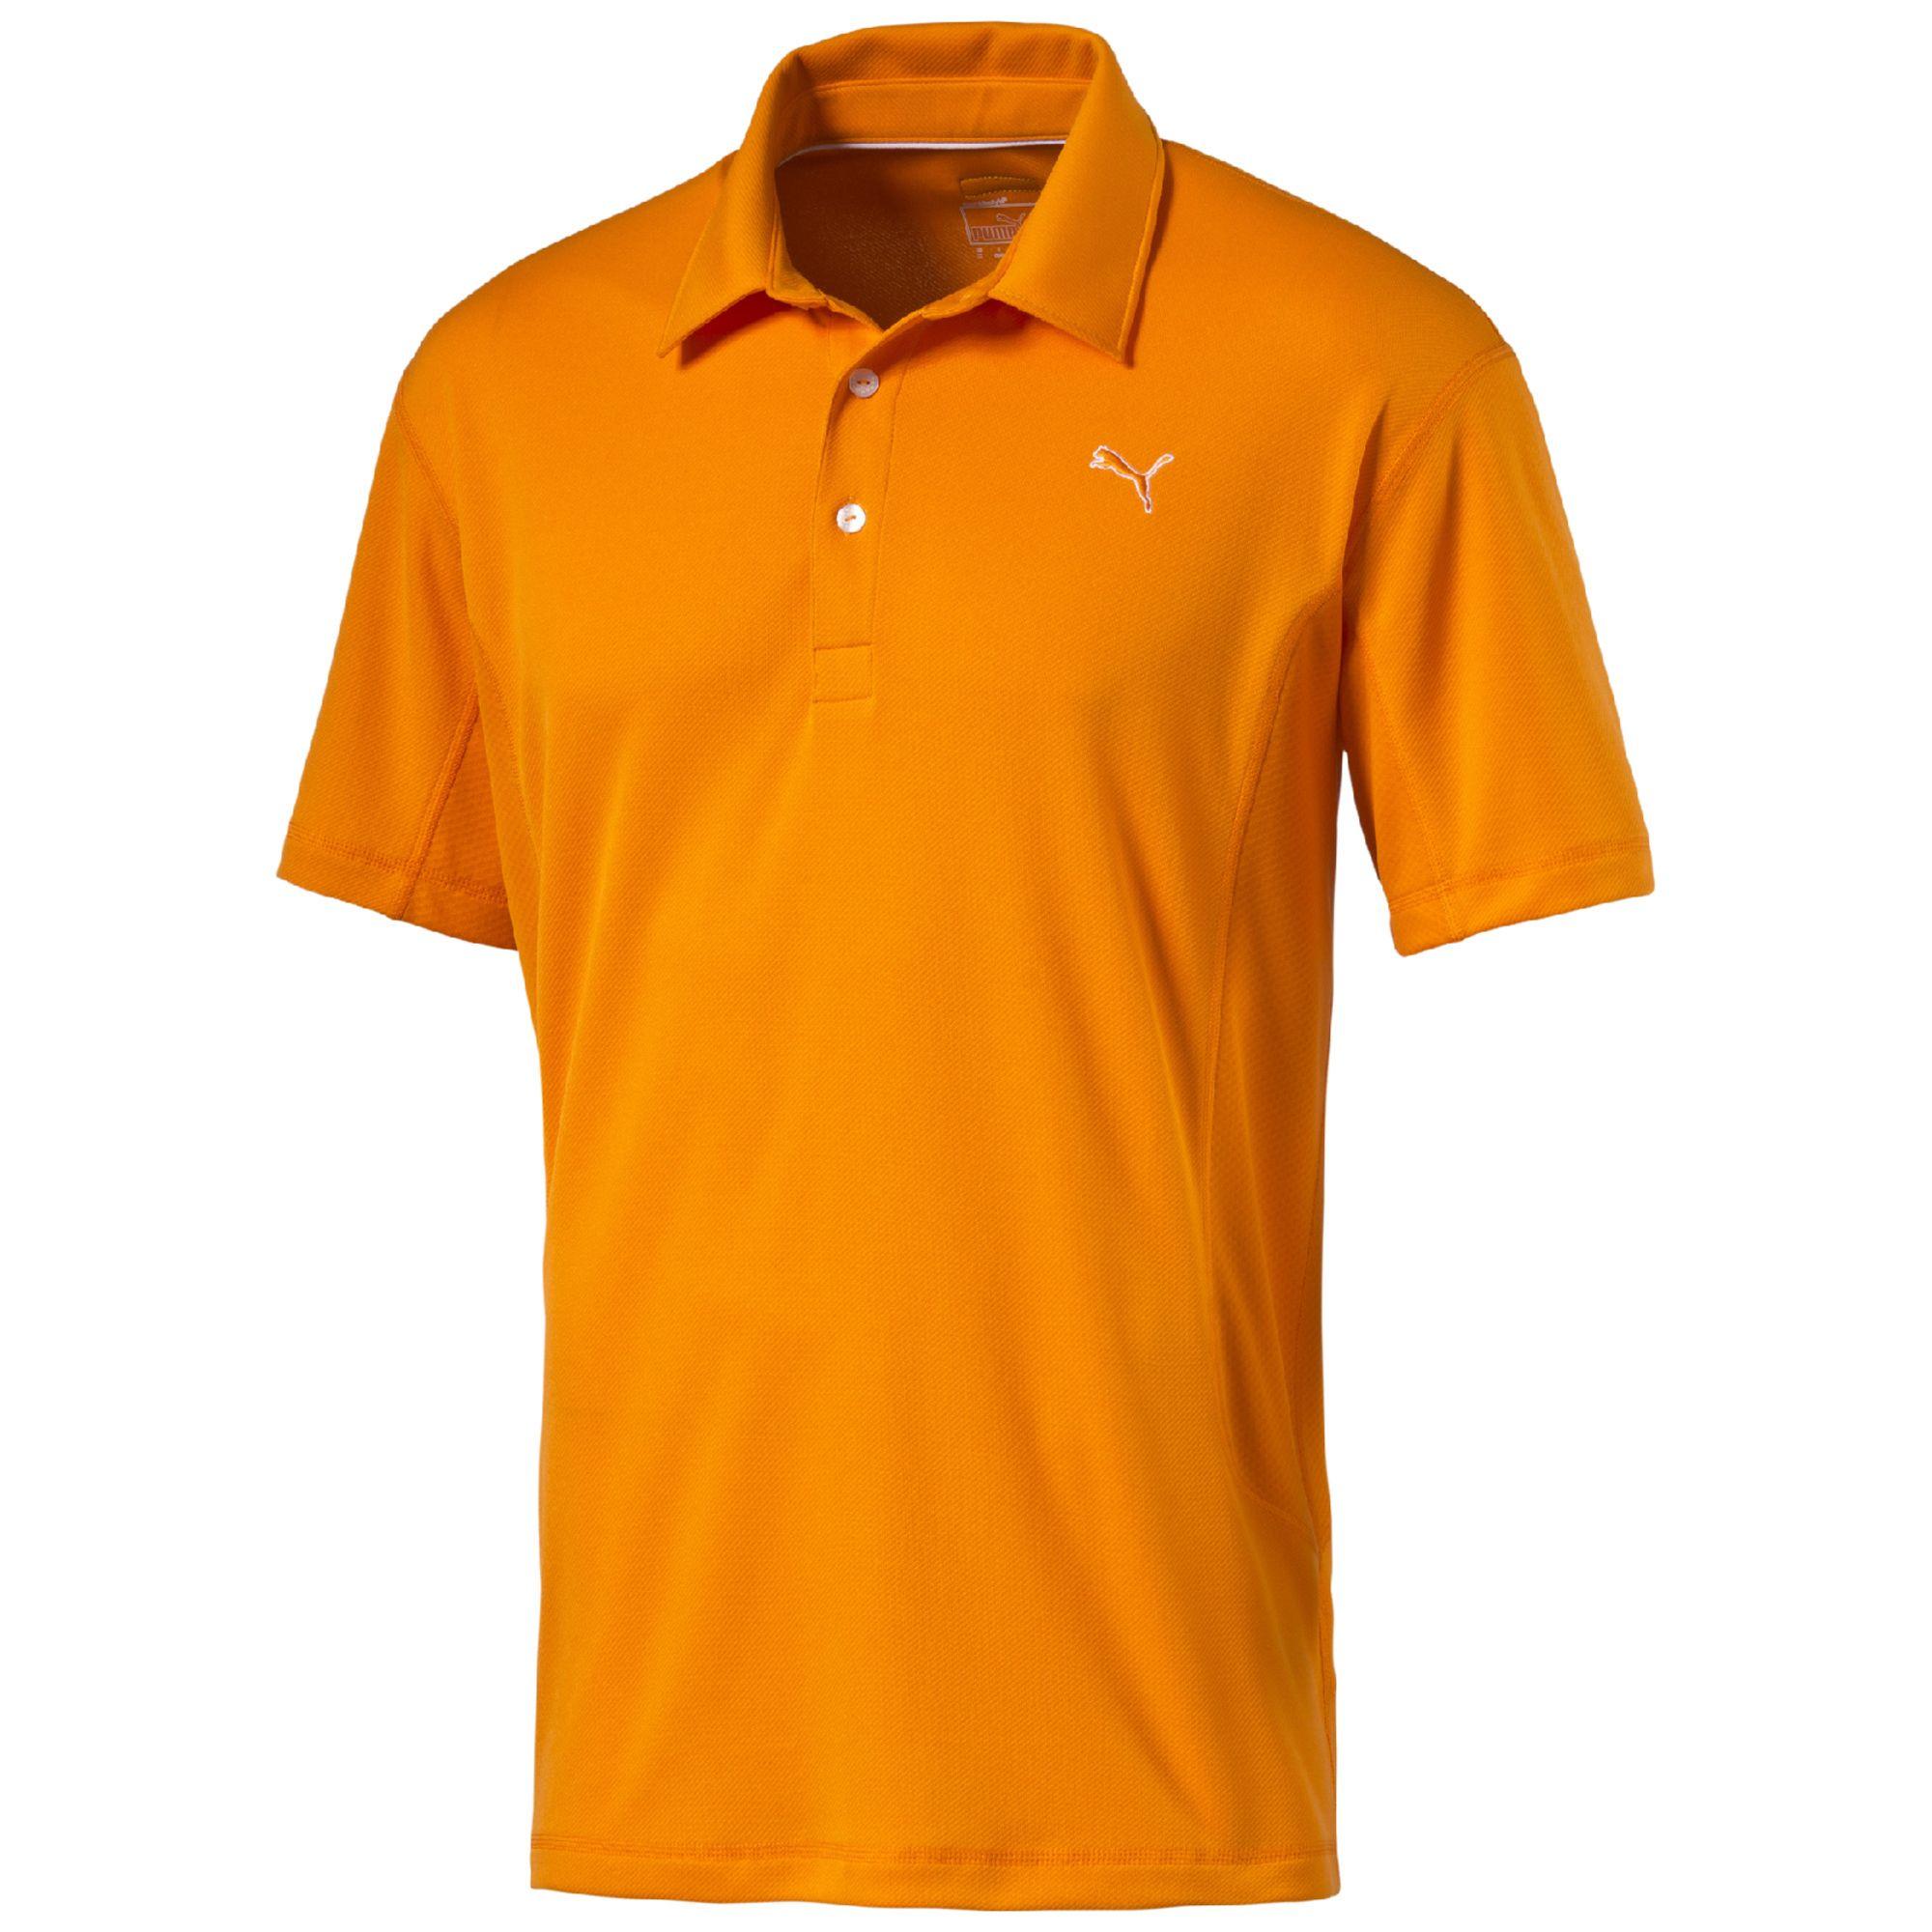 Puma Tech Golf Polo Shirt In Orange For Men Lyst